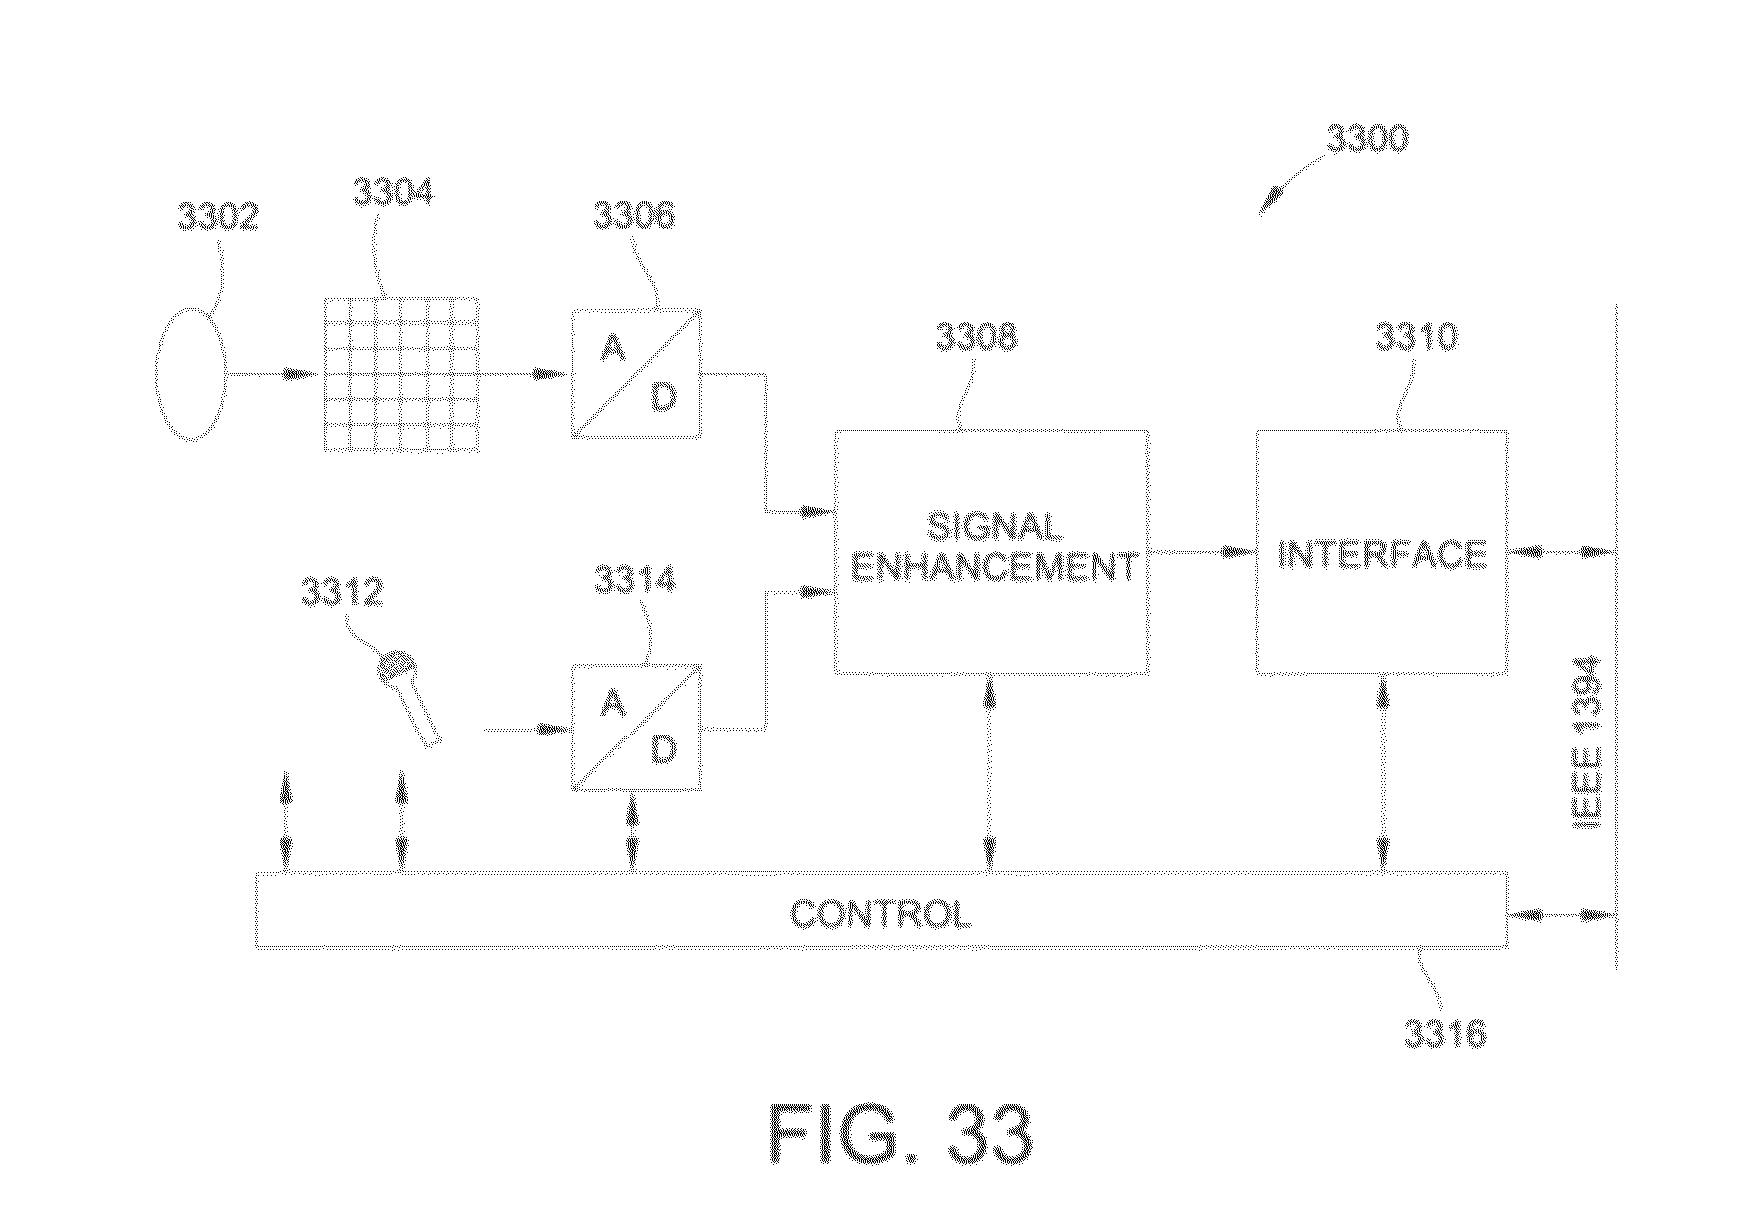 Focus Stereo Wiring Diagram Furthermore Brake Master Cylinder Diagram